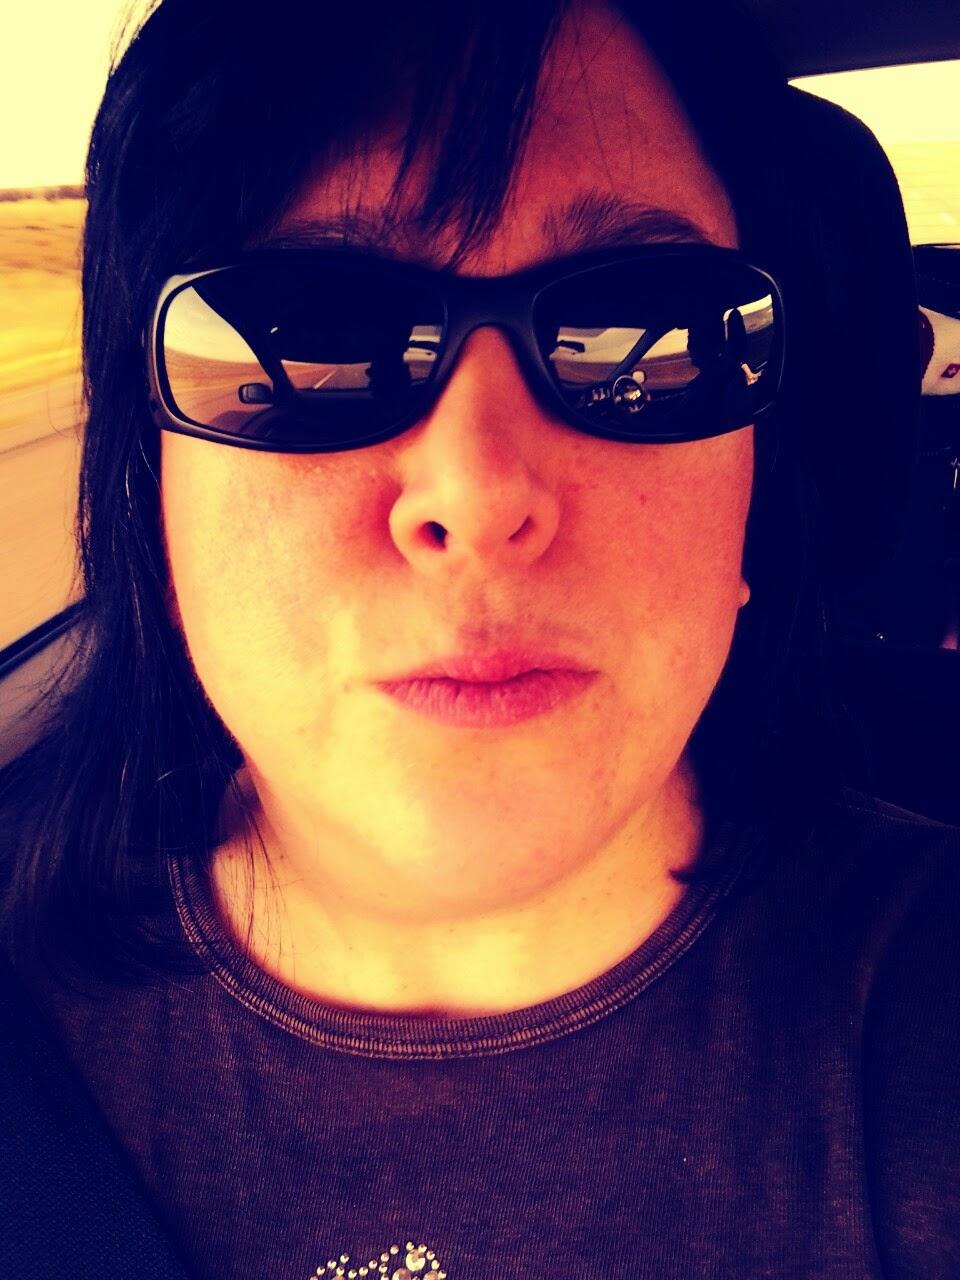 Selfie on the road. Kiss.